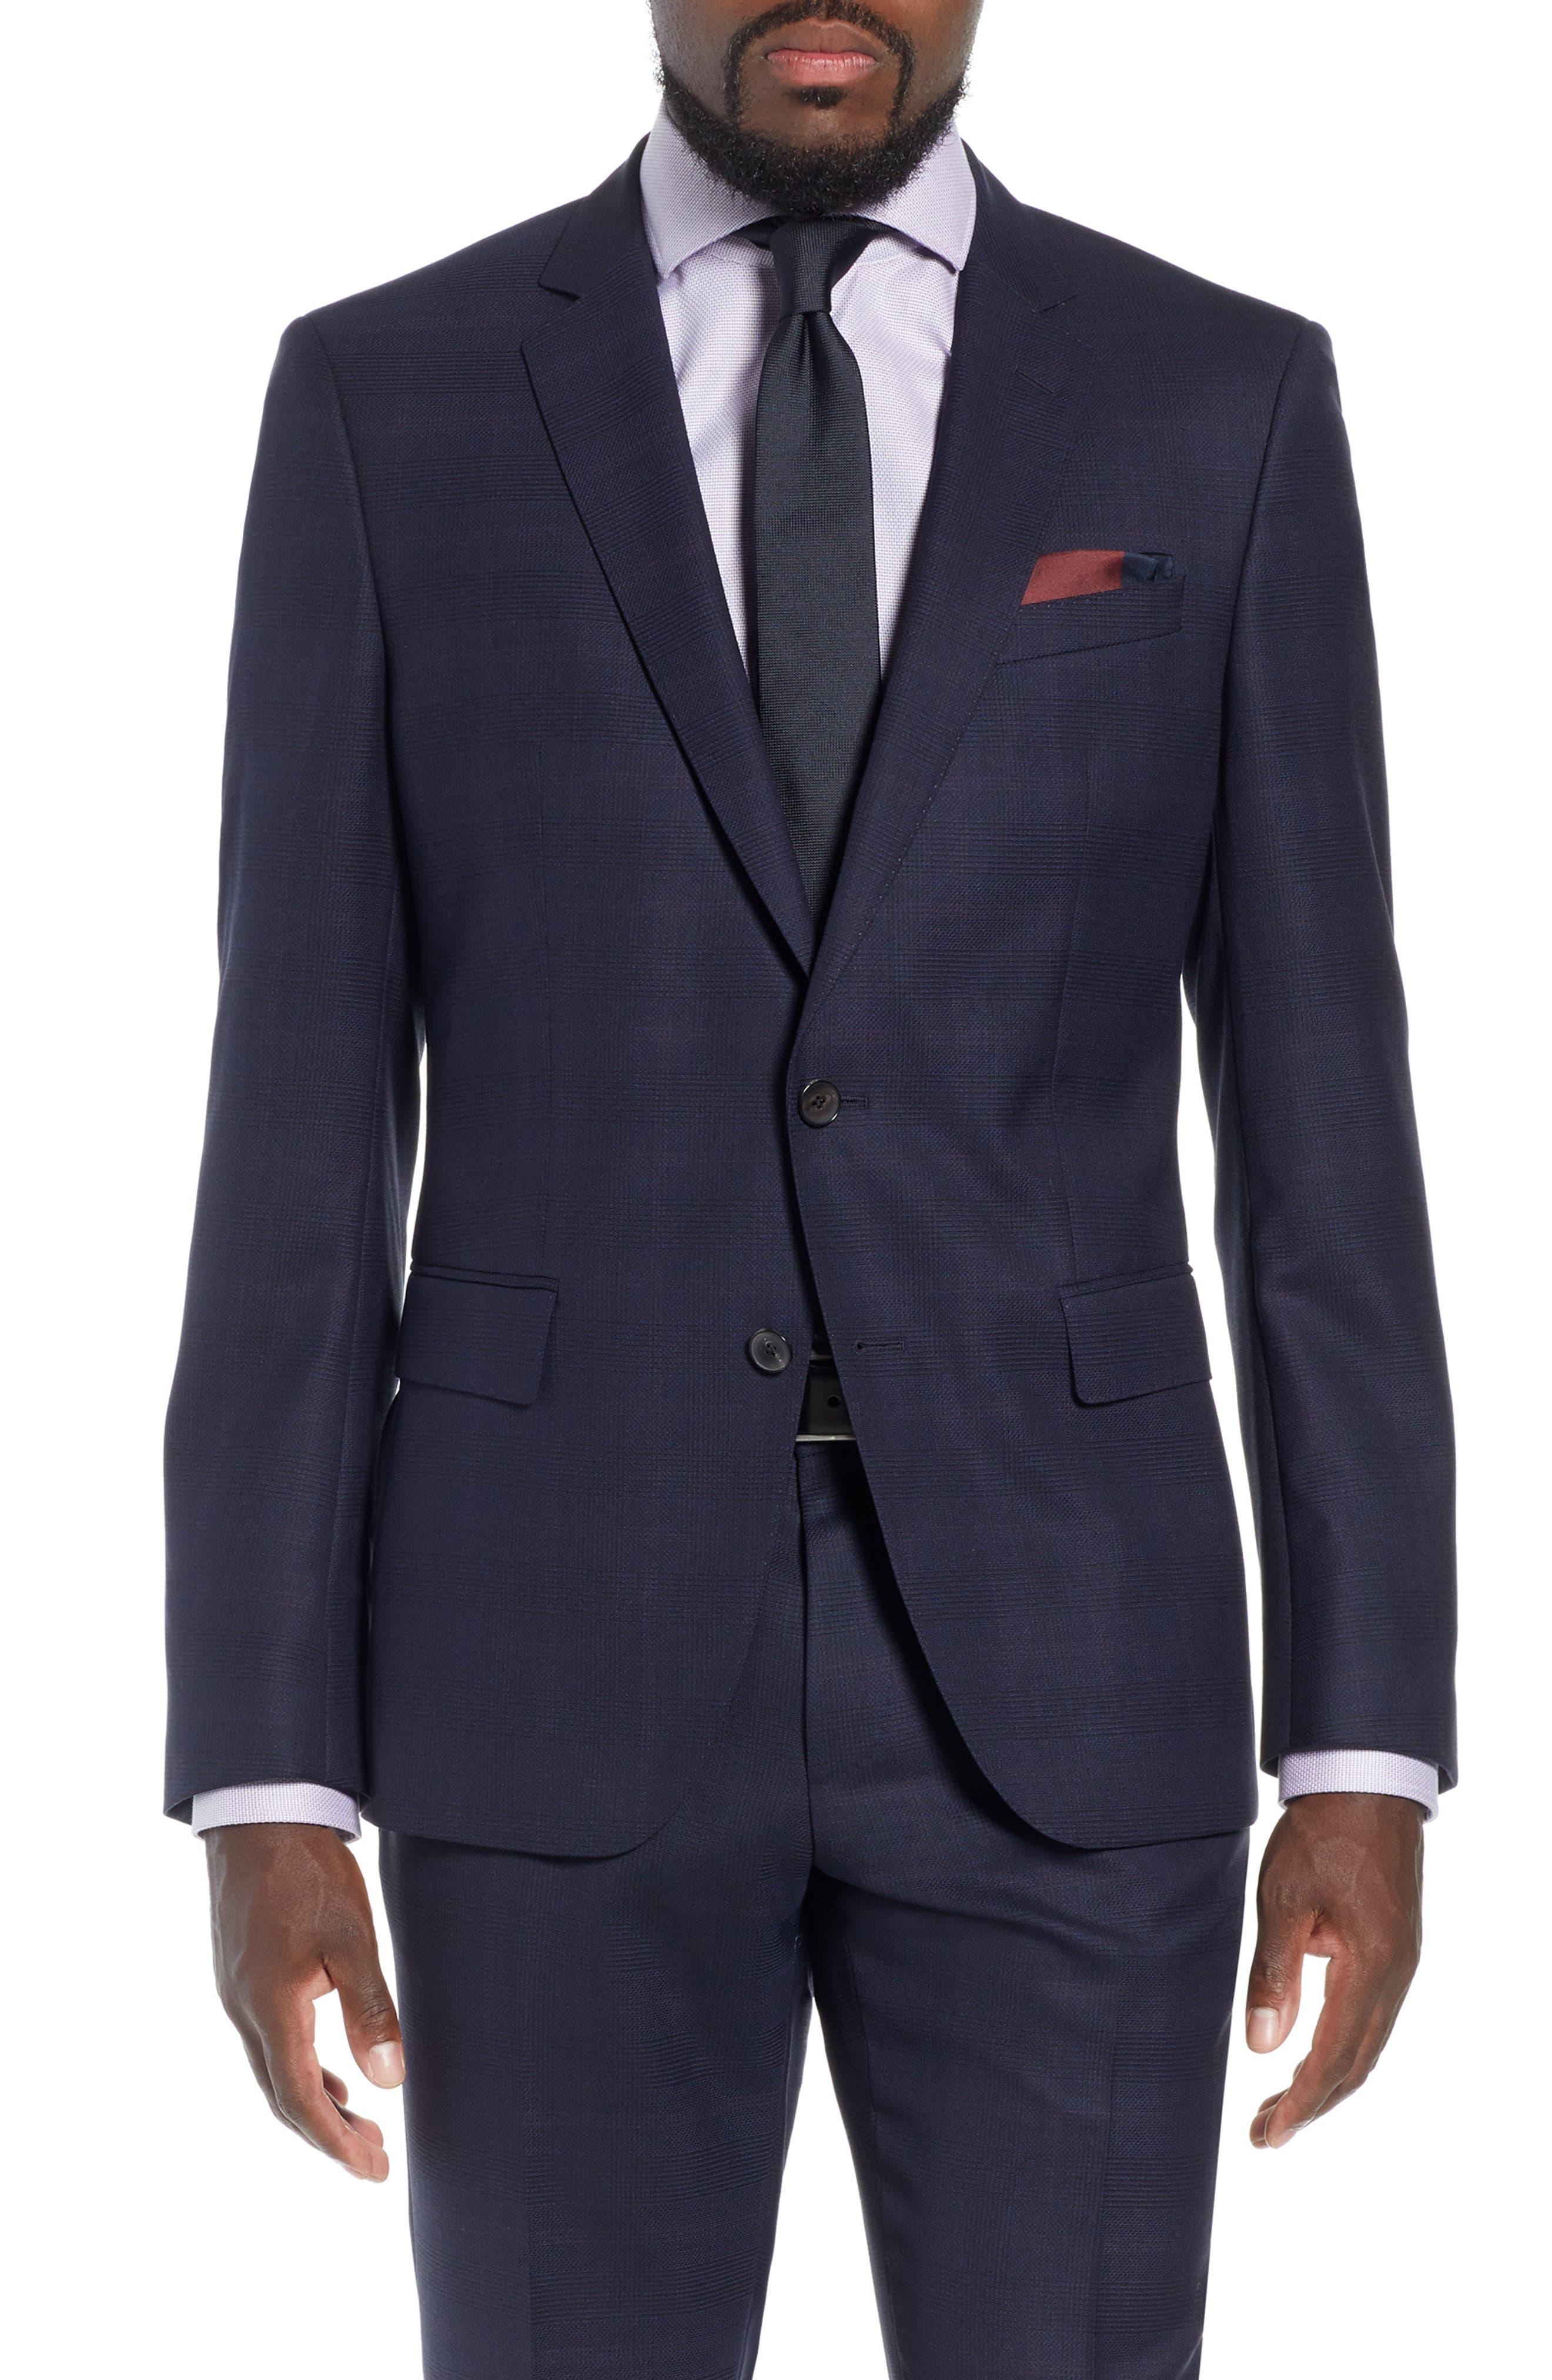 x Nordstrom Huge/Genius Trim Fit Plaid Wool Suit,                         Main,                         color, NAVY